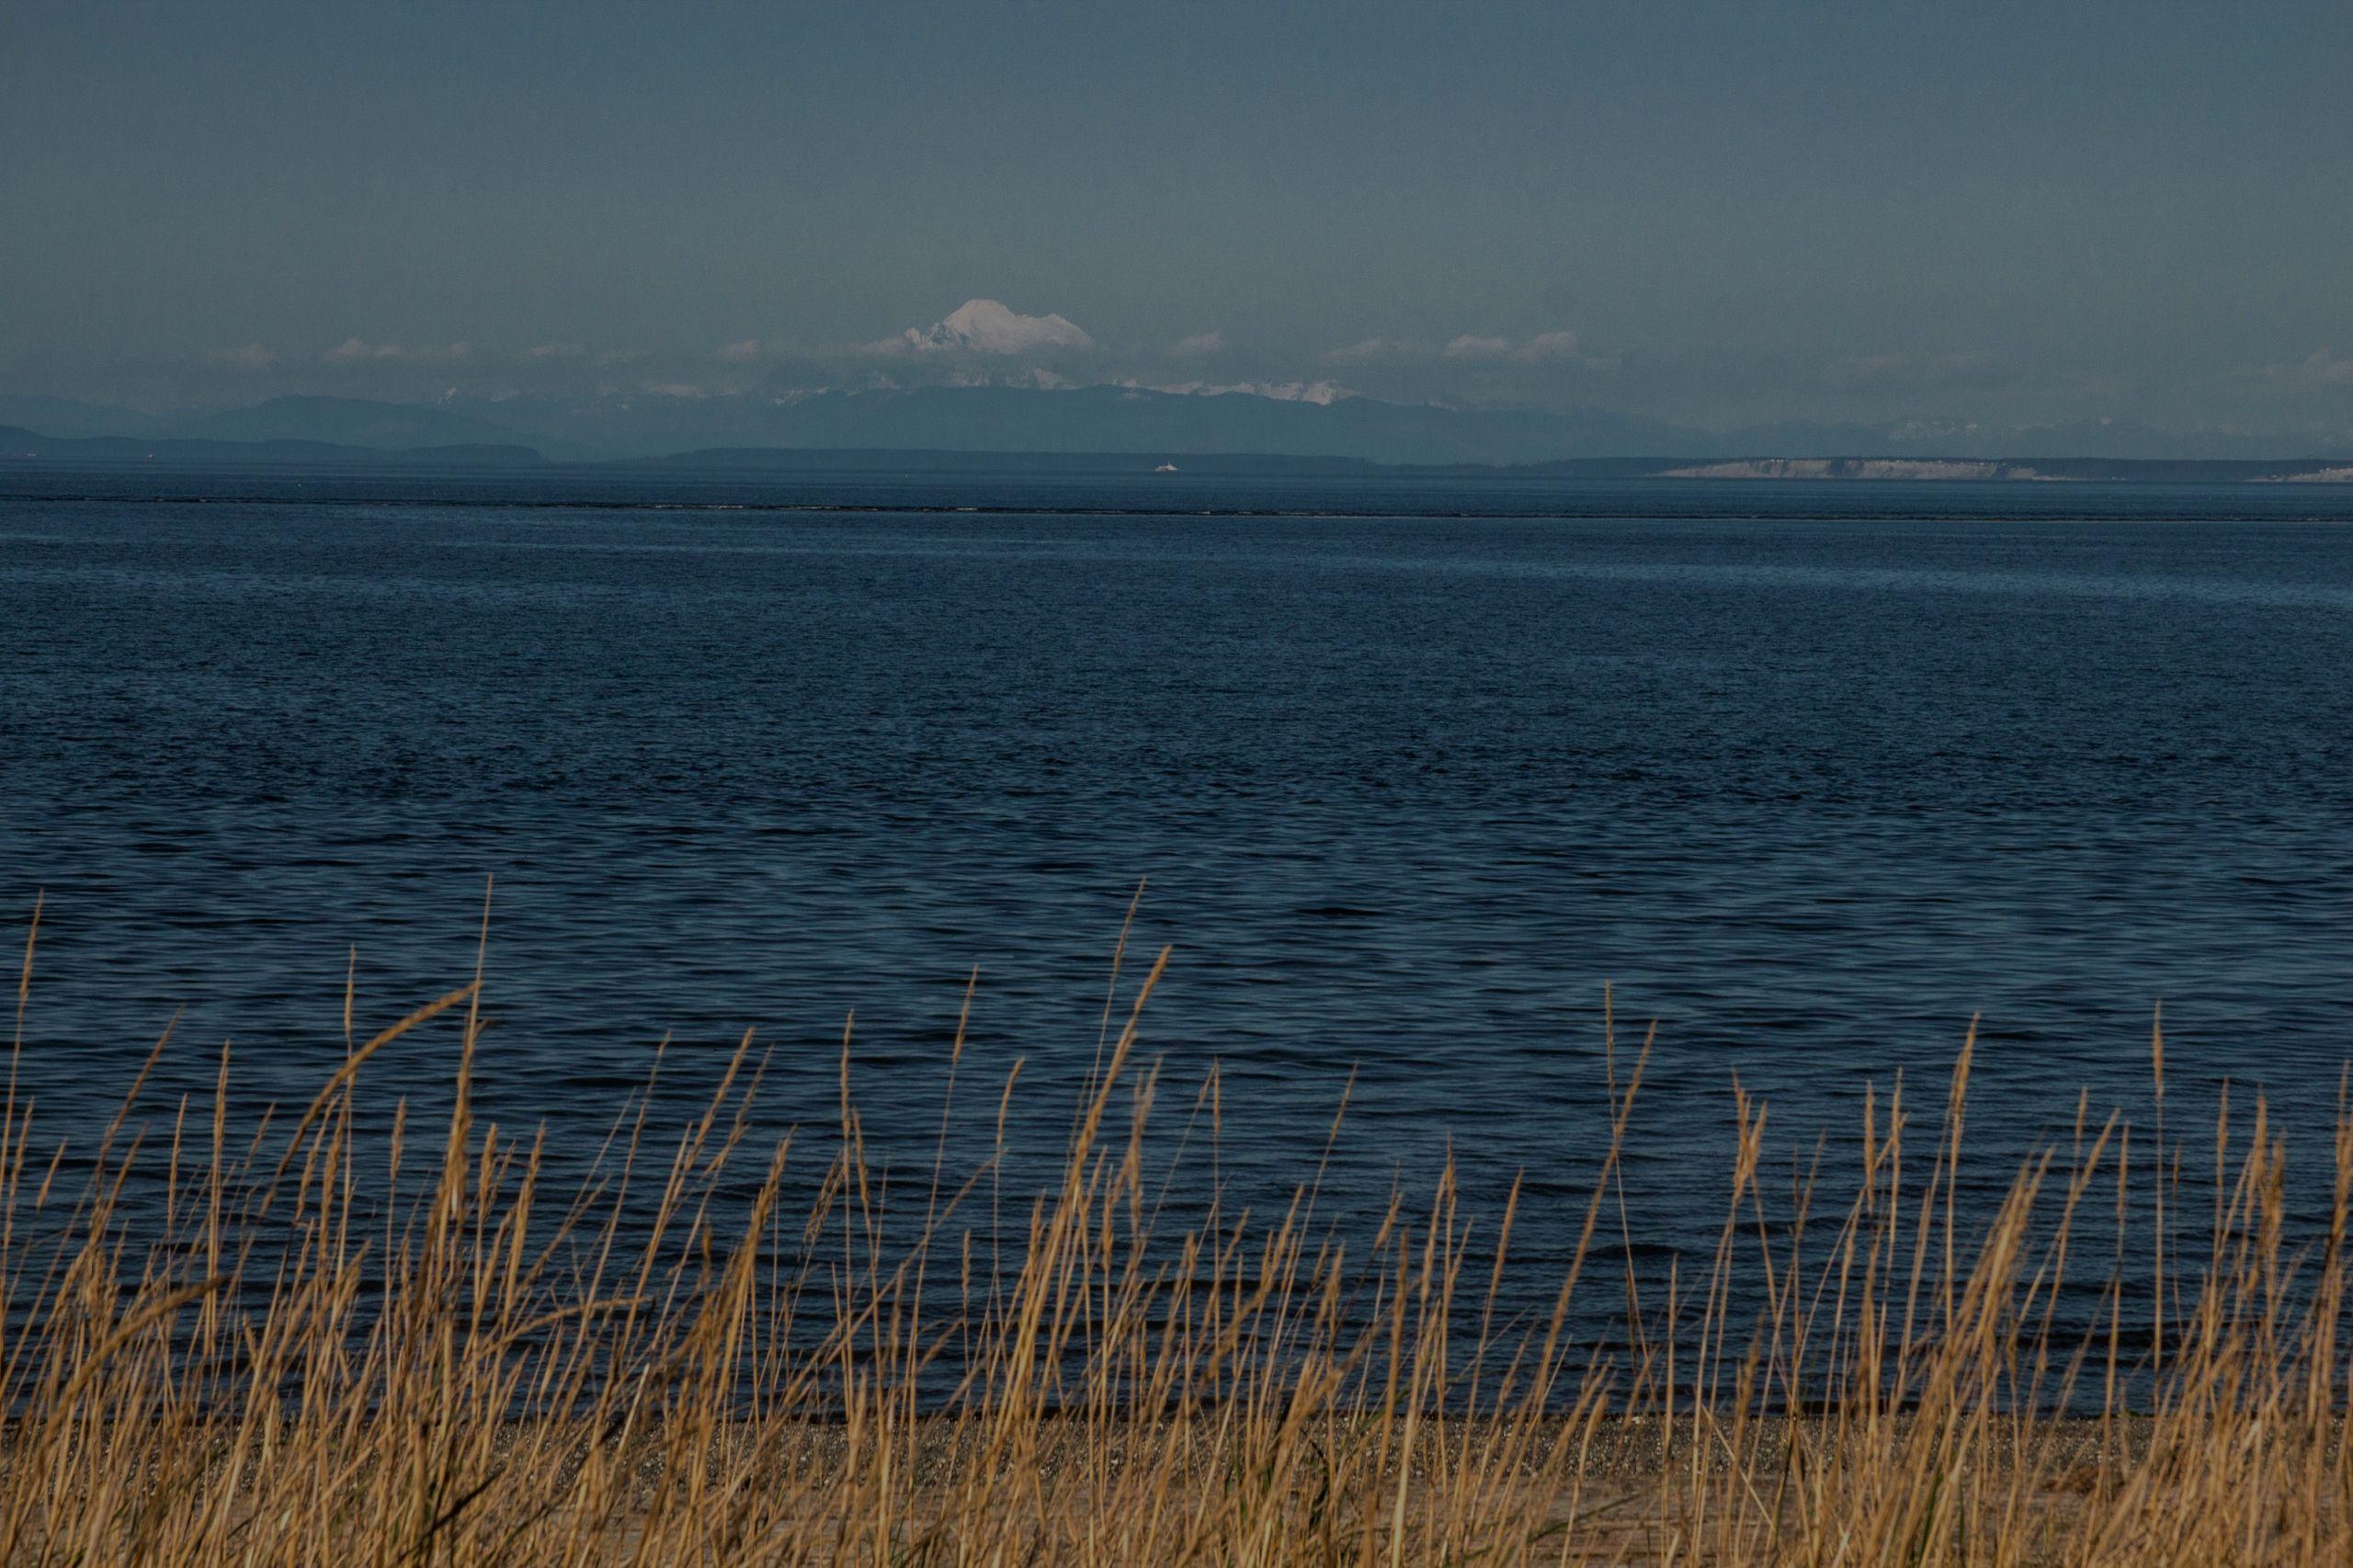 Seashore Serenity on the Olympic Peninsula